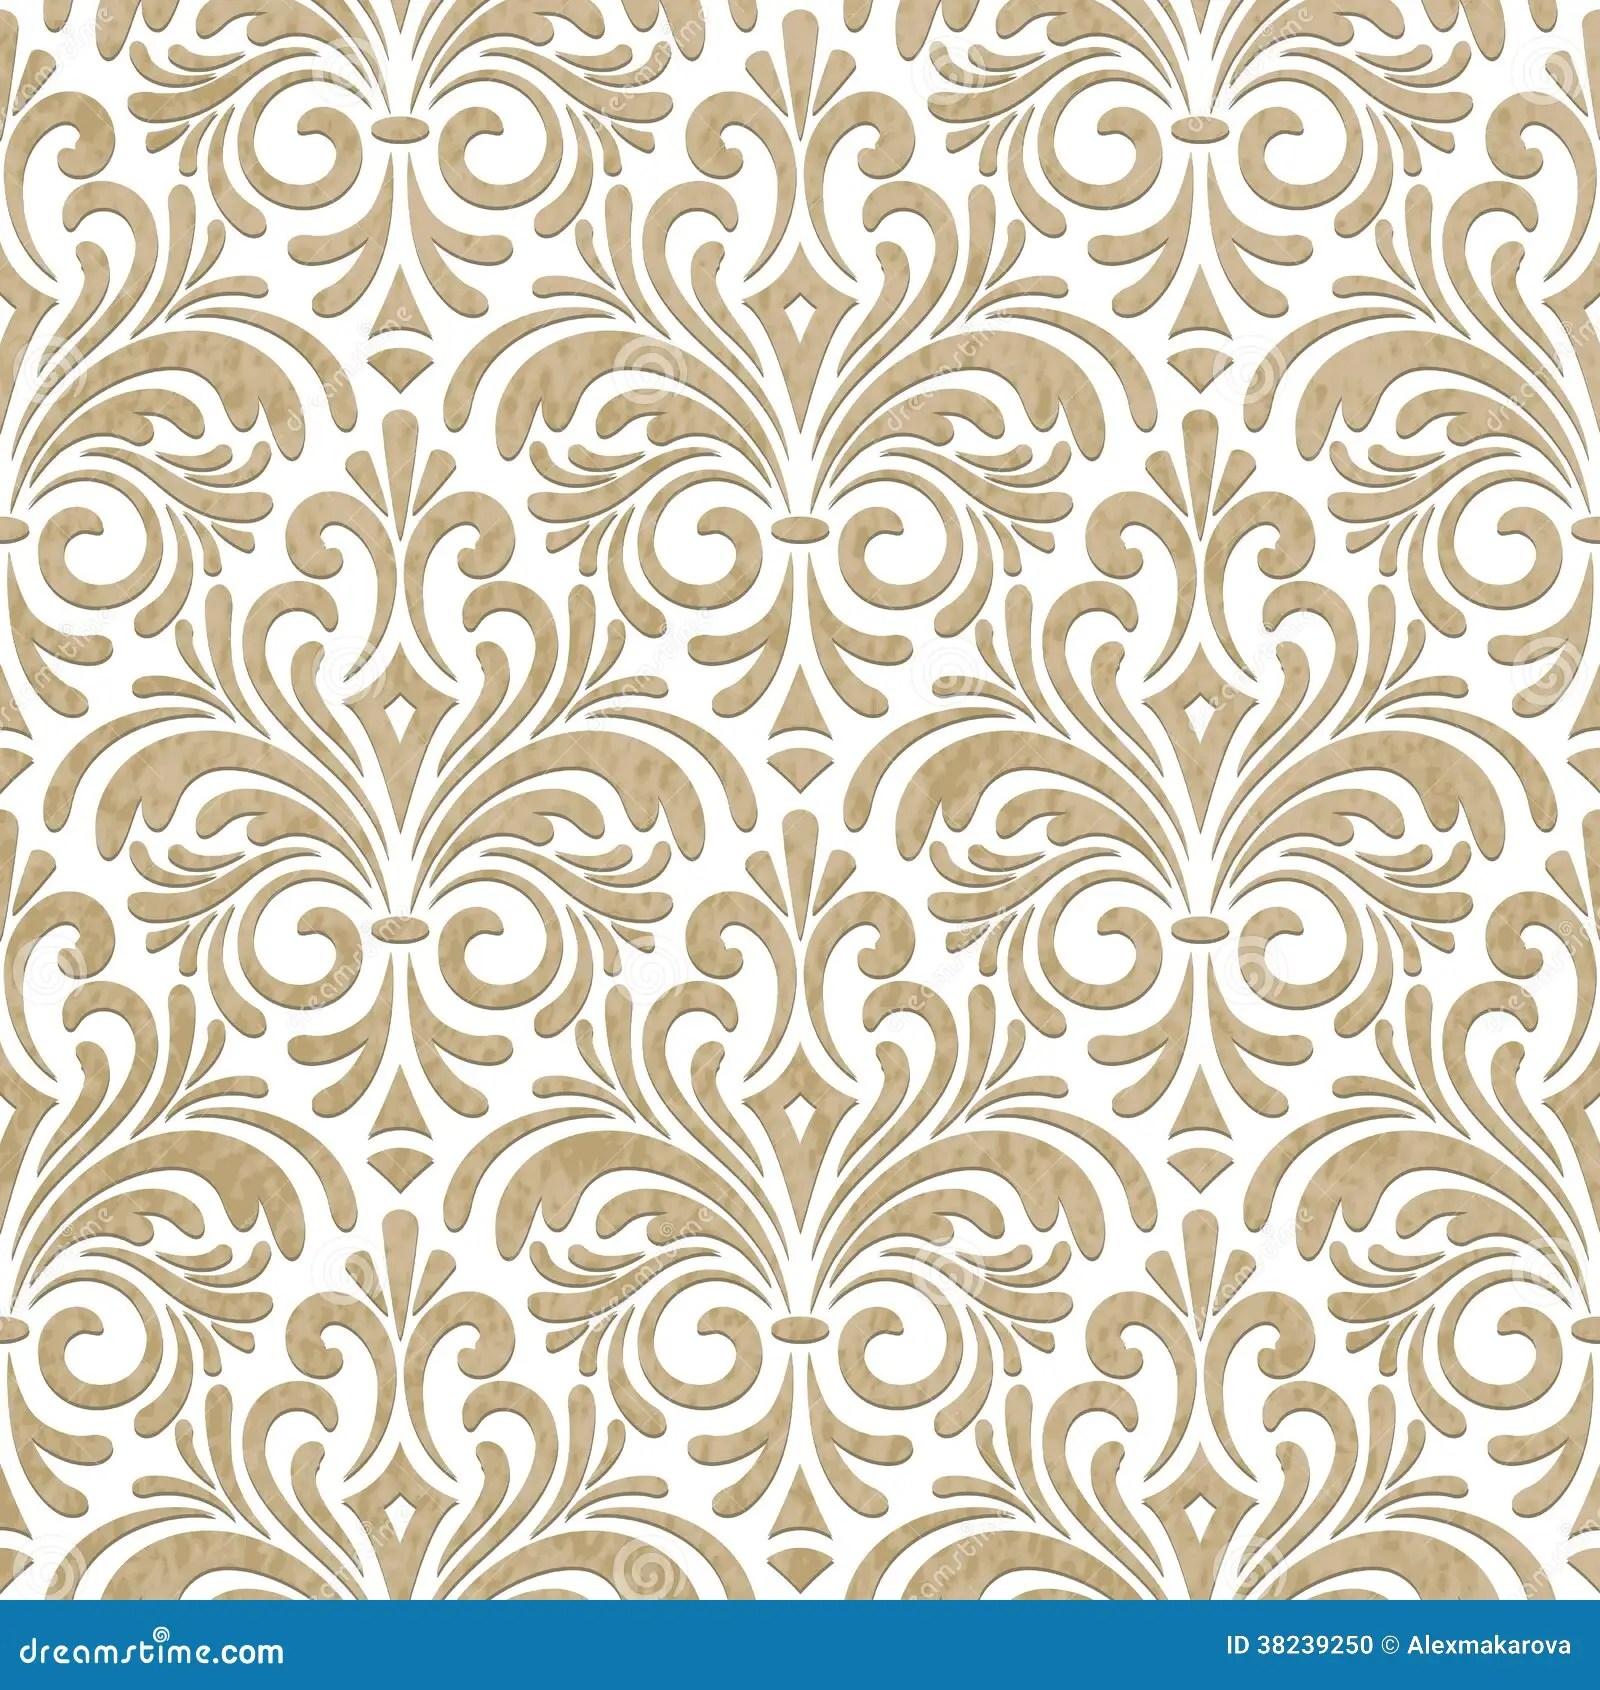 seamless floral paper cut